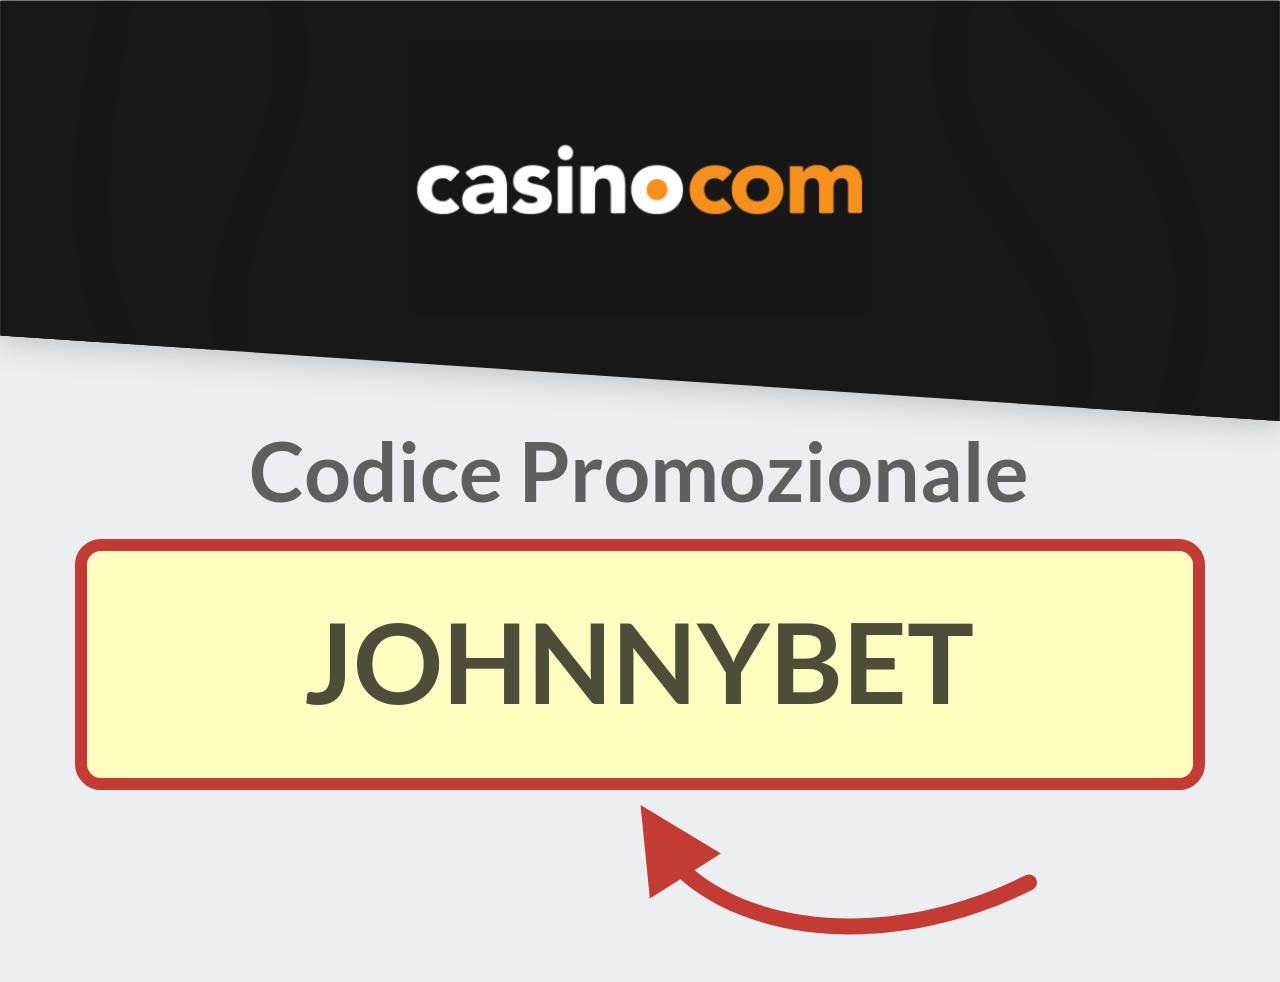 Codice Bonus Casino.com